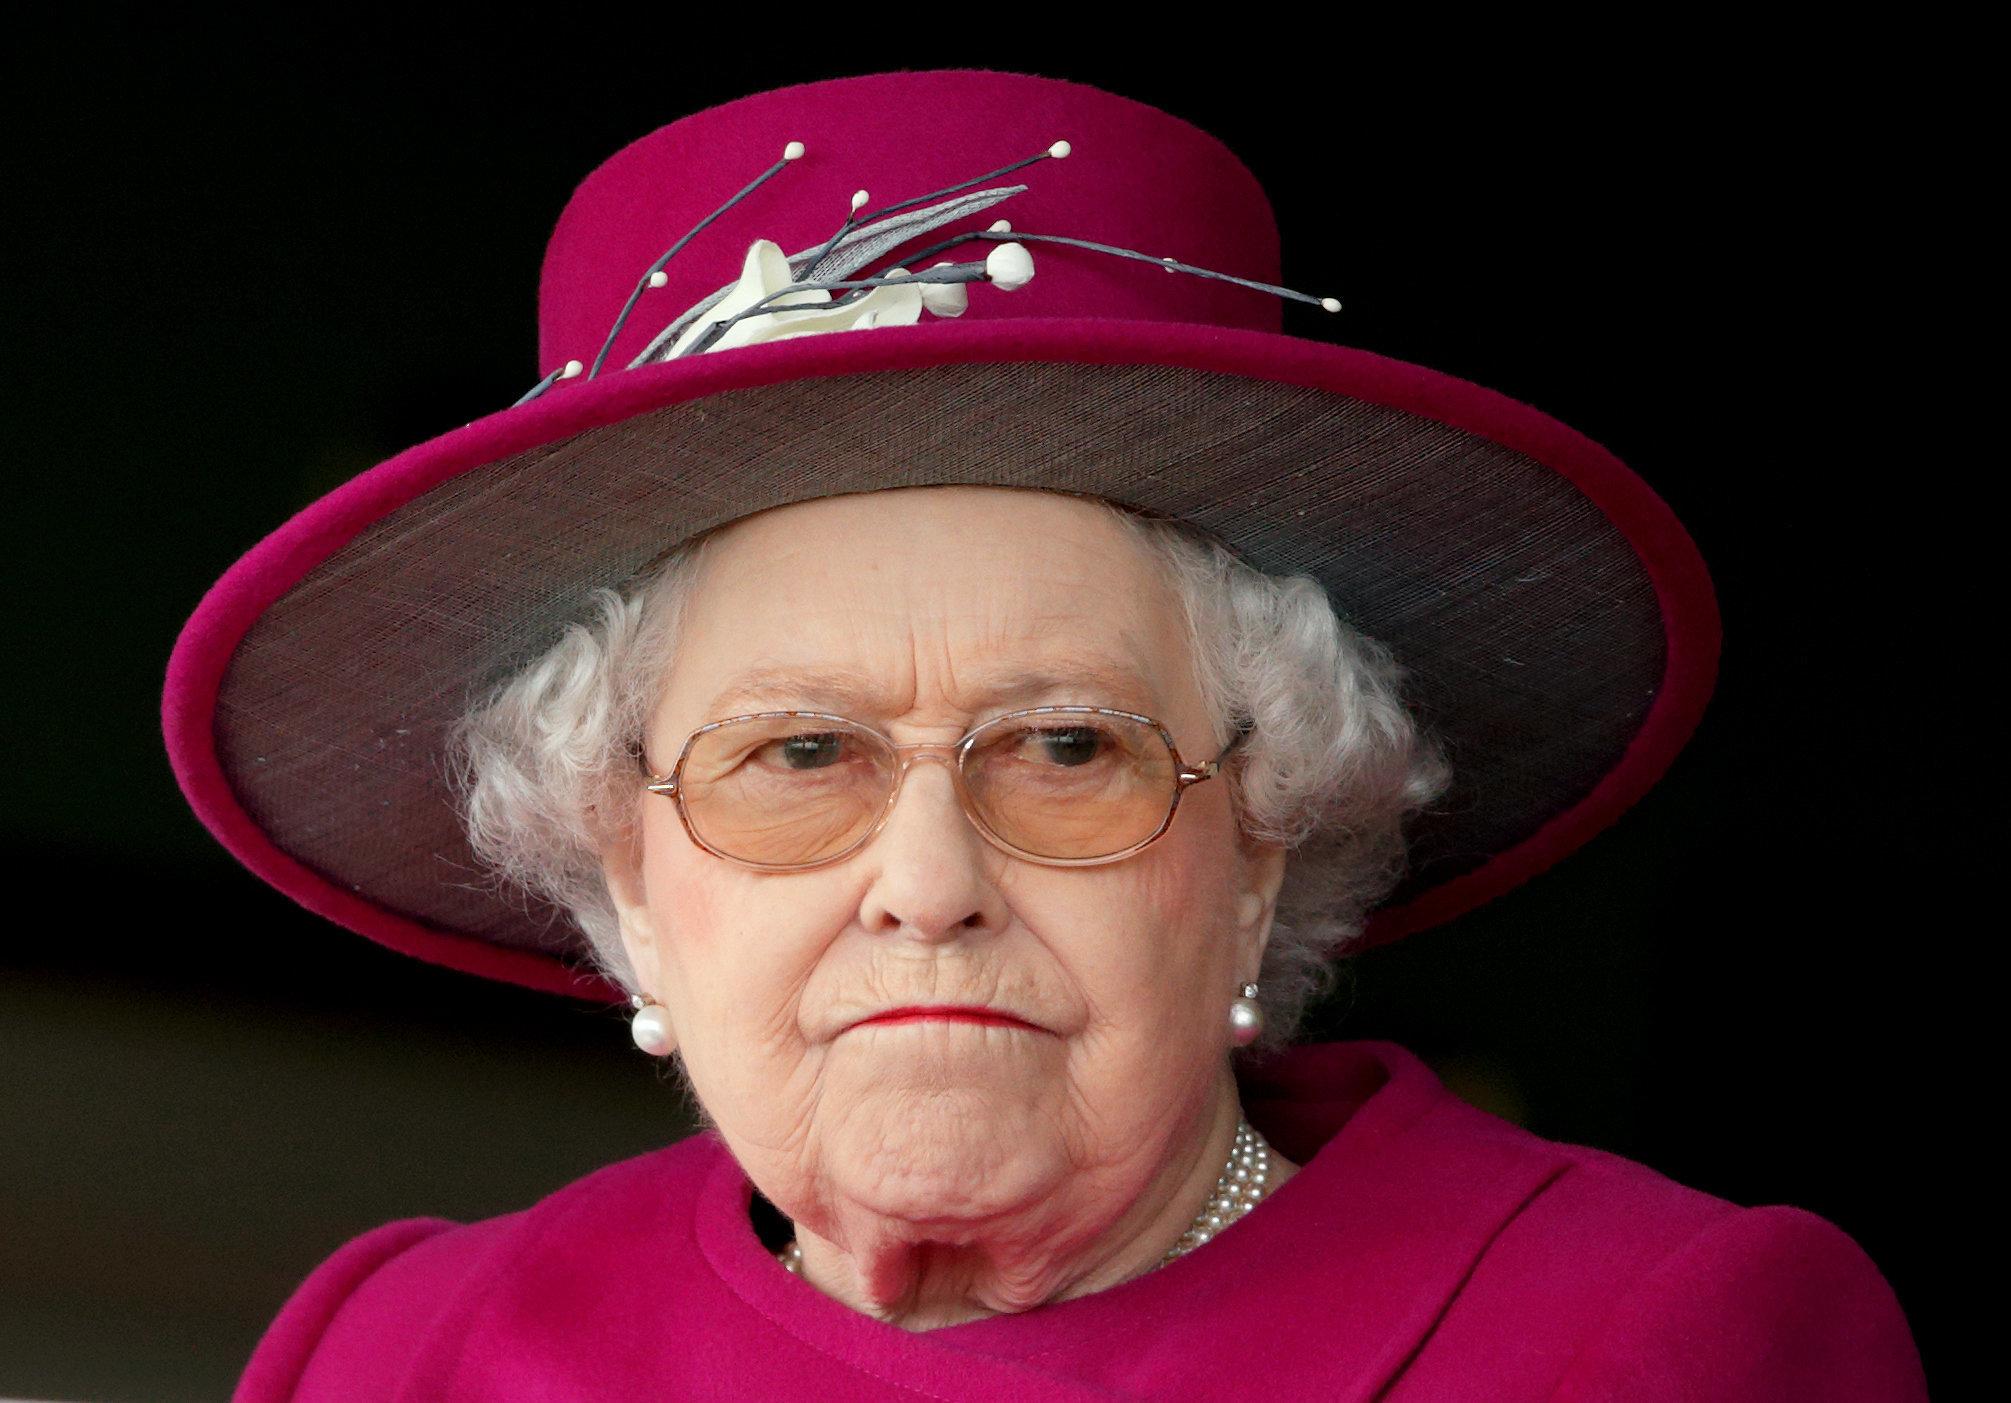 Donald Trump may visit the Queen at Balmoral, according to